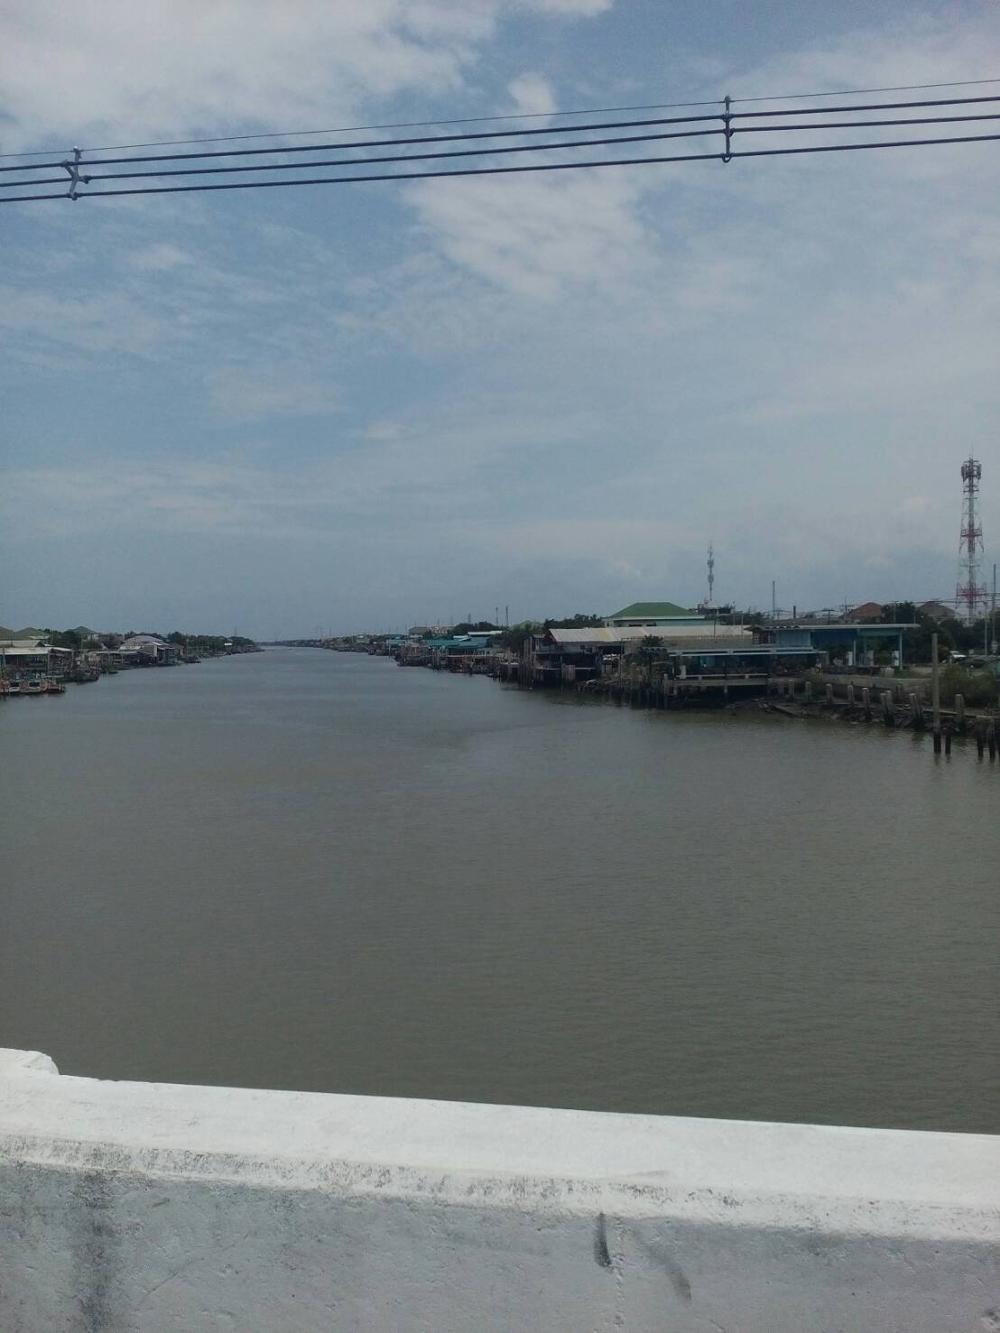 12552 sq.m. Land in Sumut Prakarn middle of Thailand